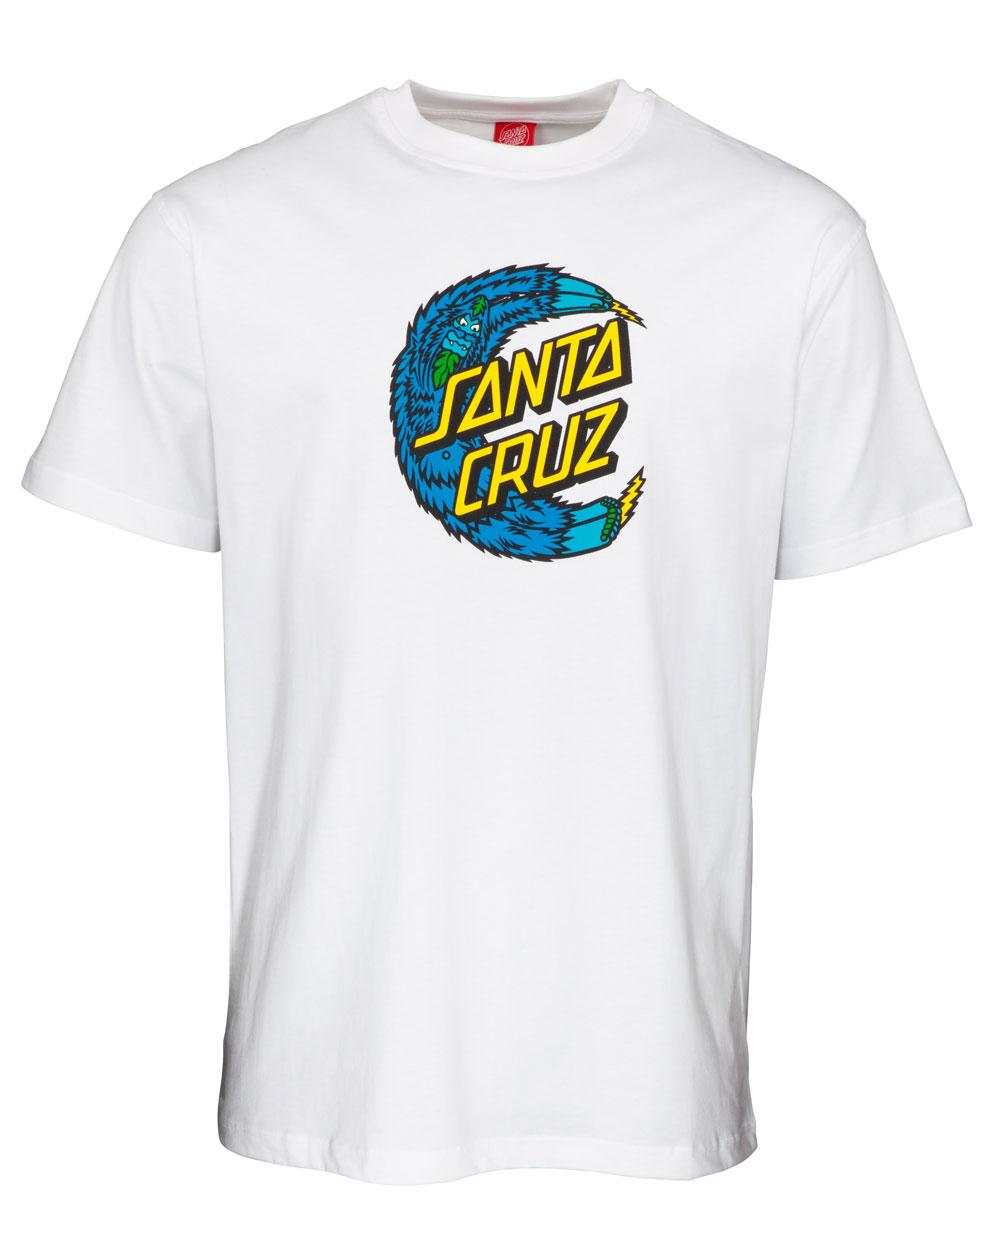 Santa Cruz Men's T-Shirt Bigfoot Moon Dot White